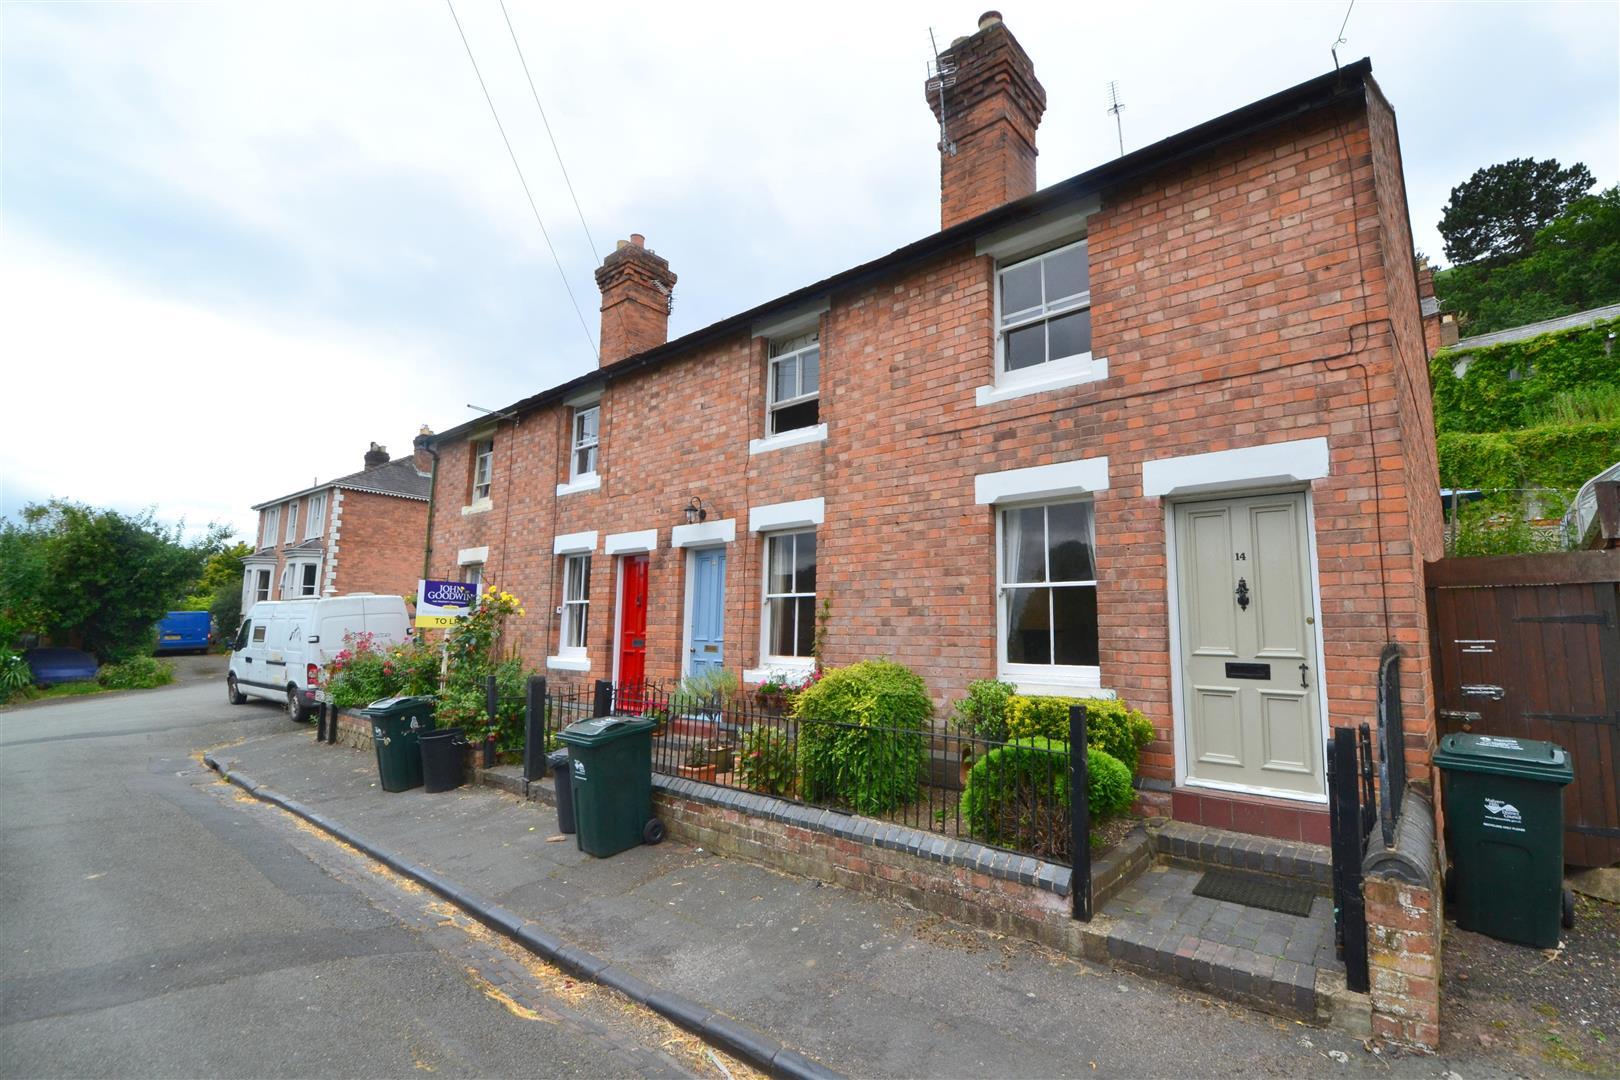 Oxford Road, Malvern